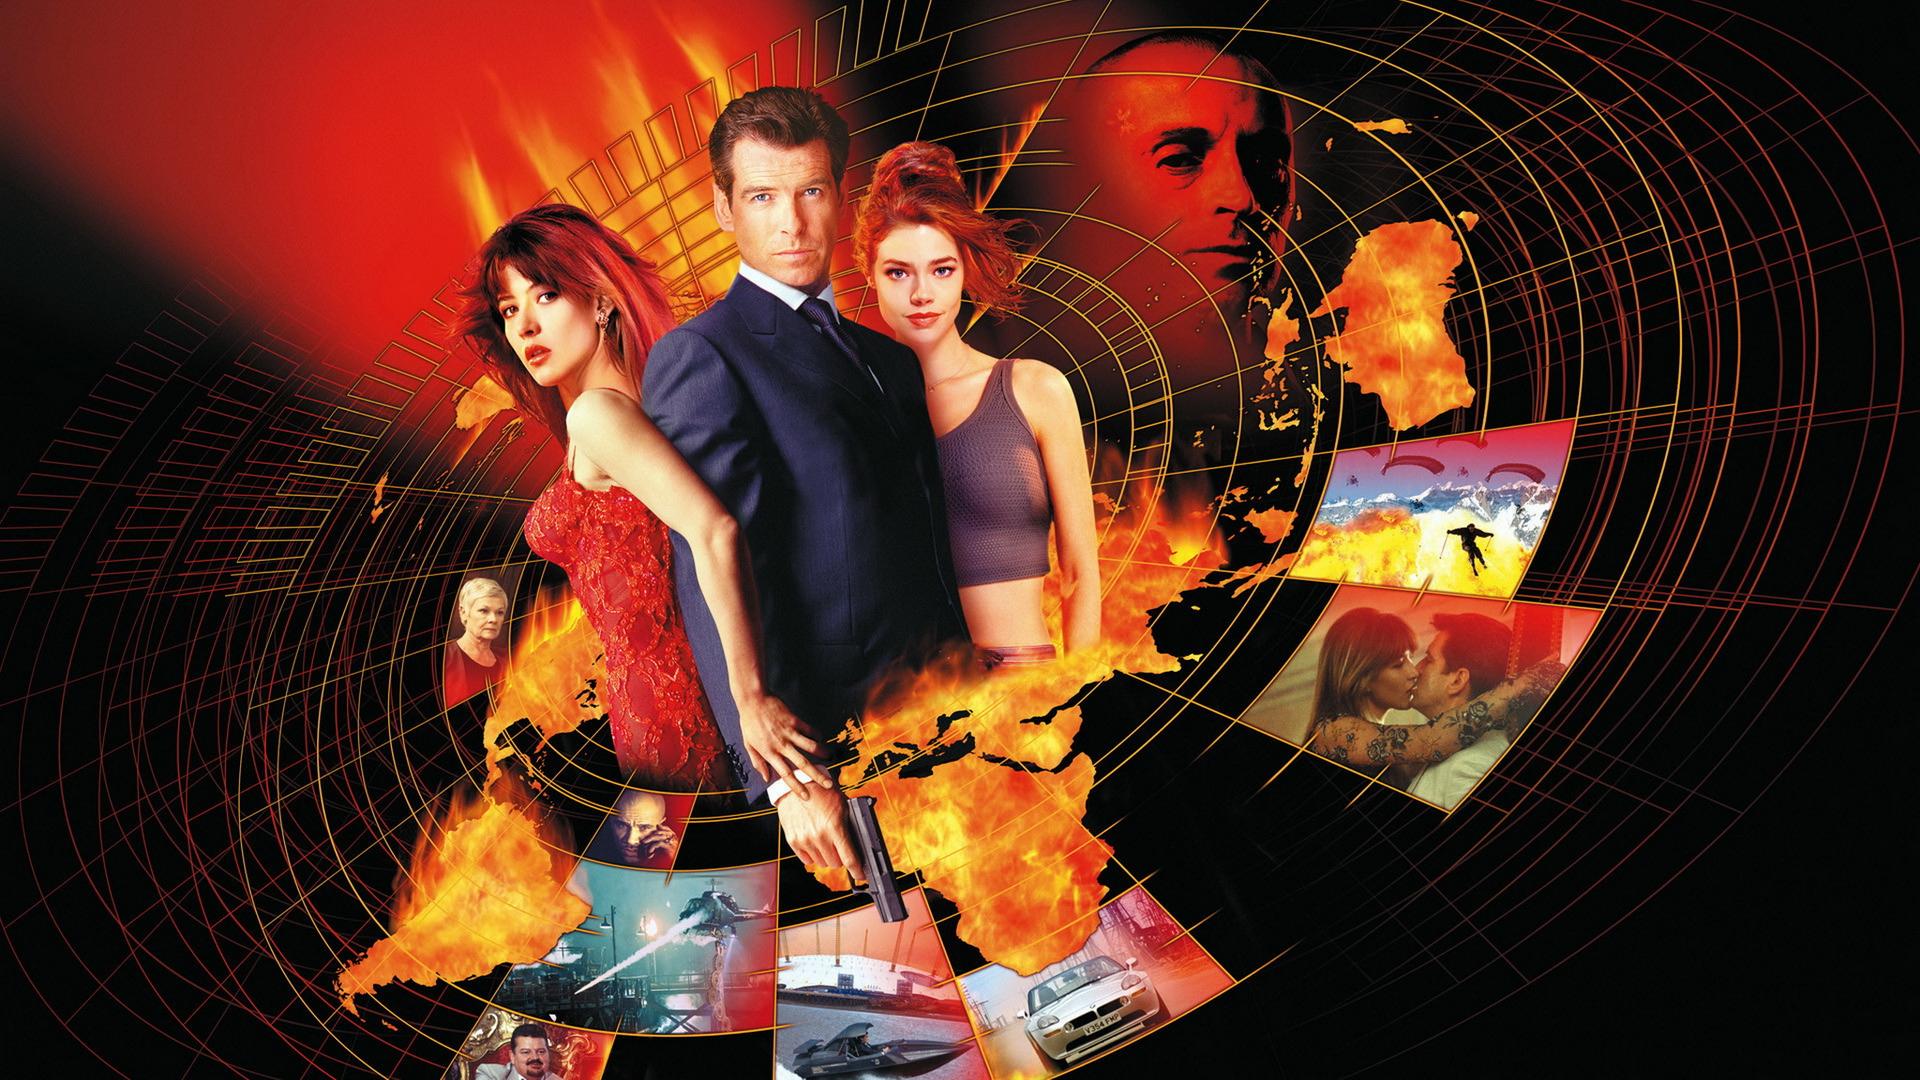 James Bond Wallpaper Hd 1080p 8 HD Desktop Wallpapers 1920x1080